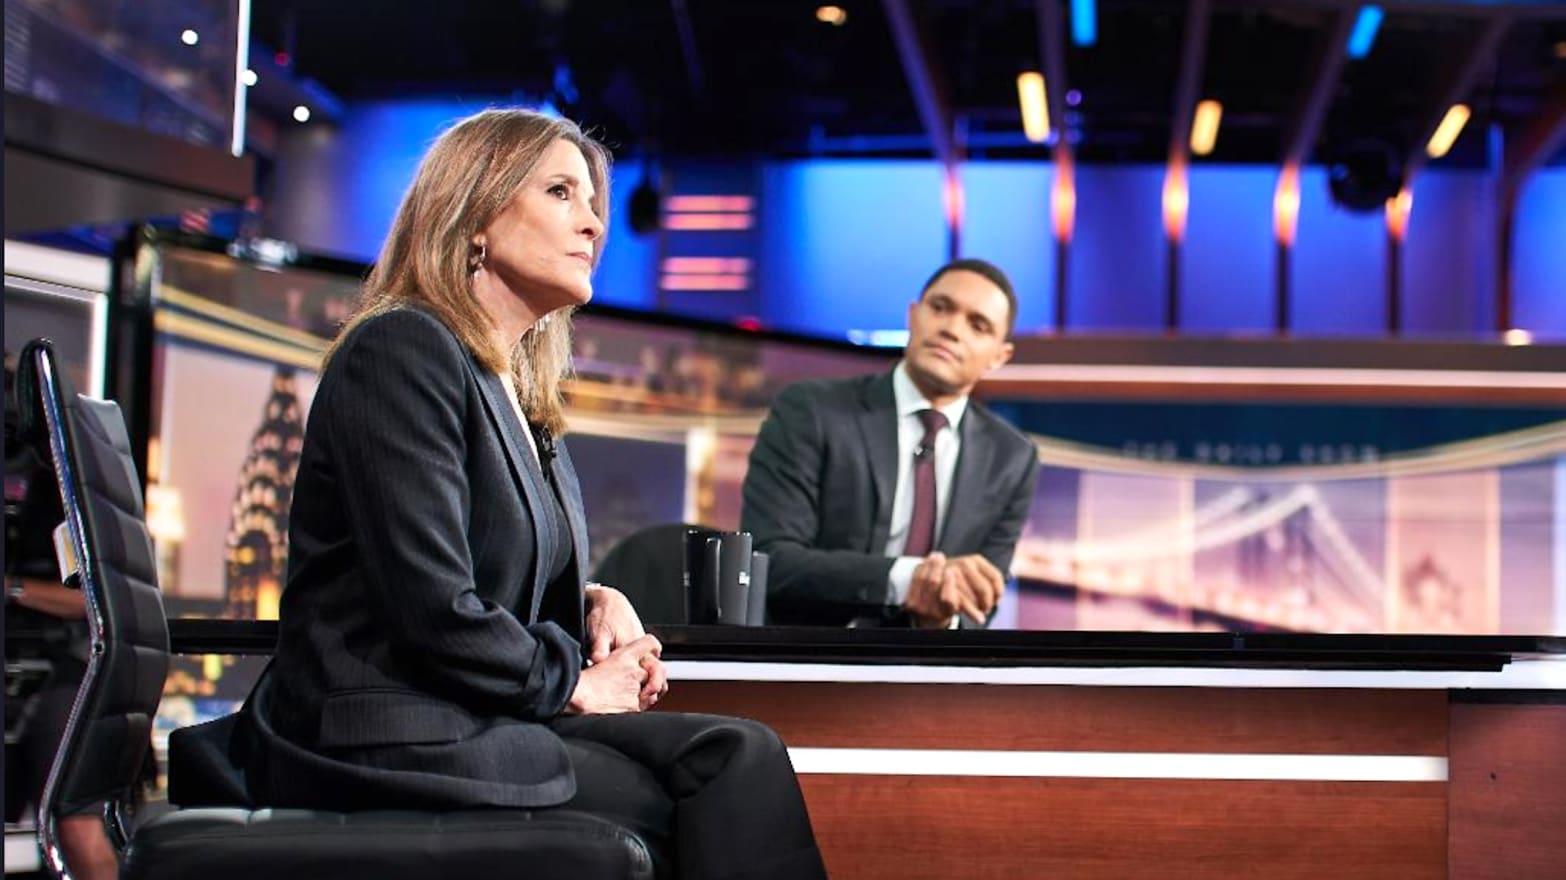 Marianne Williamson Convinces 'Daily Show' Host Trevor Noah She's 'Pro-Vaccine'